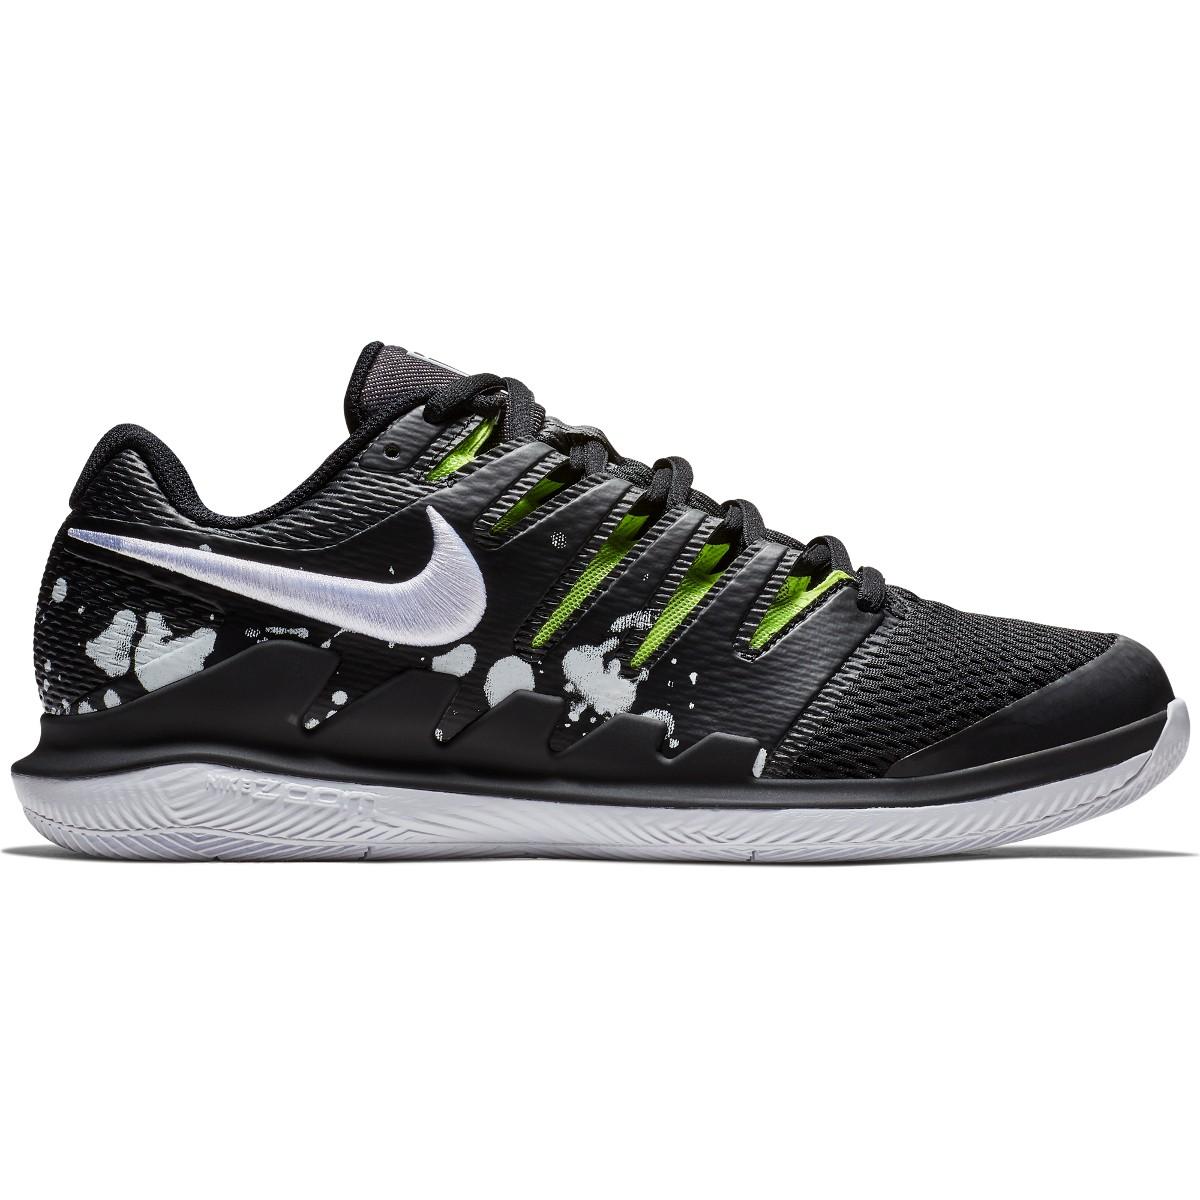 Chaussure tennis femme Nike Air Zoom Vapor 10 Vapor X Premium